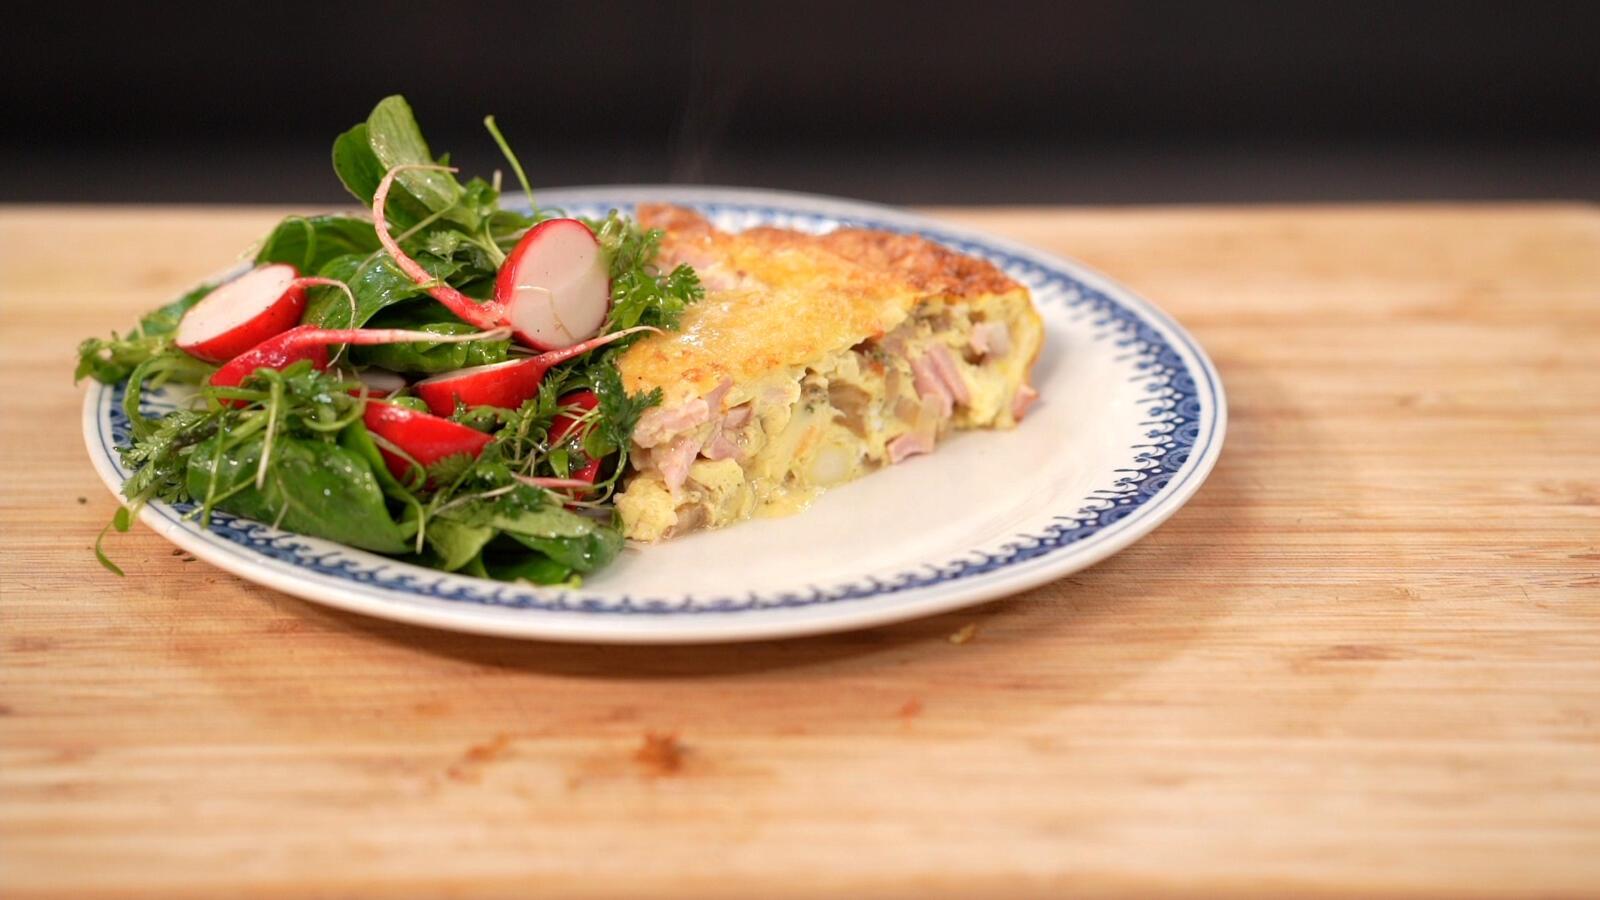 Omelet met asperges en gerookte ham, tuinkers, radijsjes en veldsla